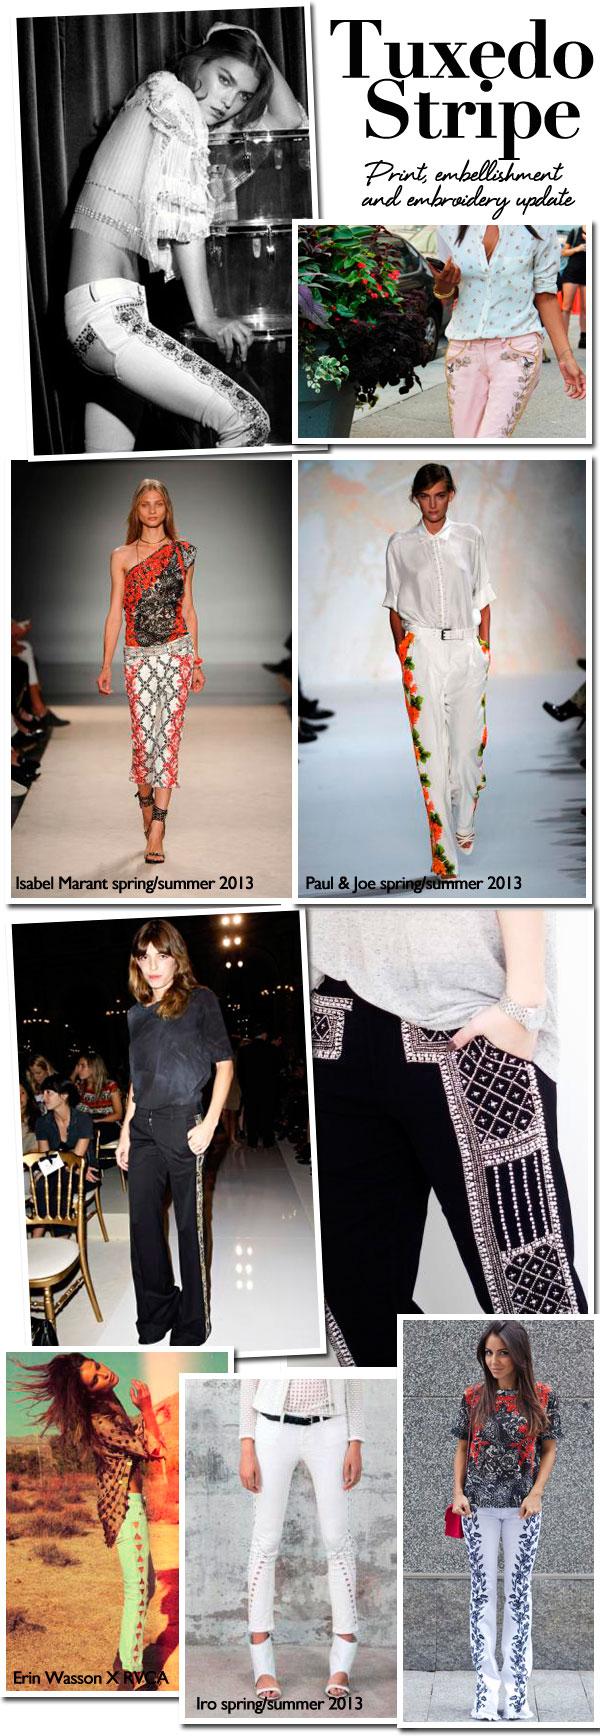 tuxedo-stripe-isabel-marant-pant-calca-inspired